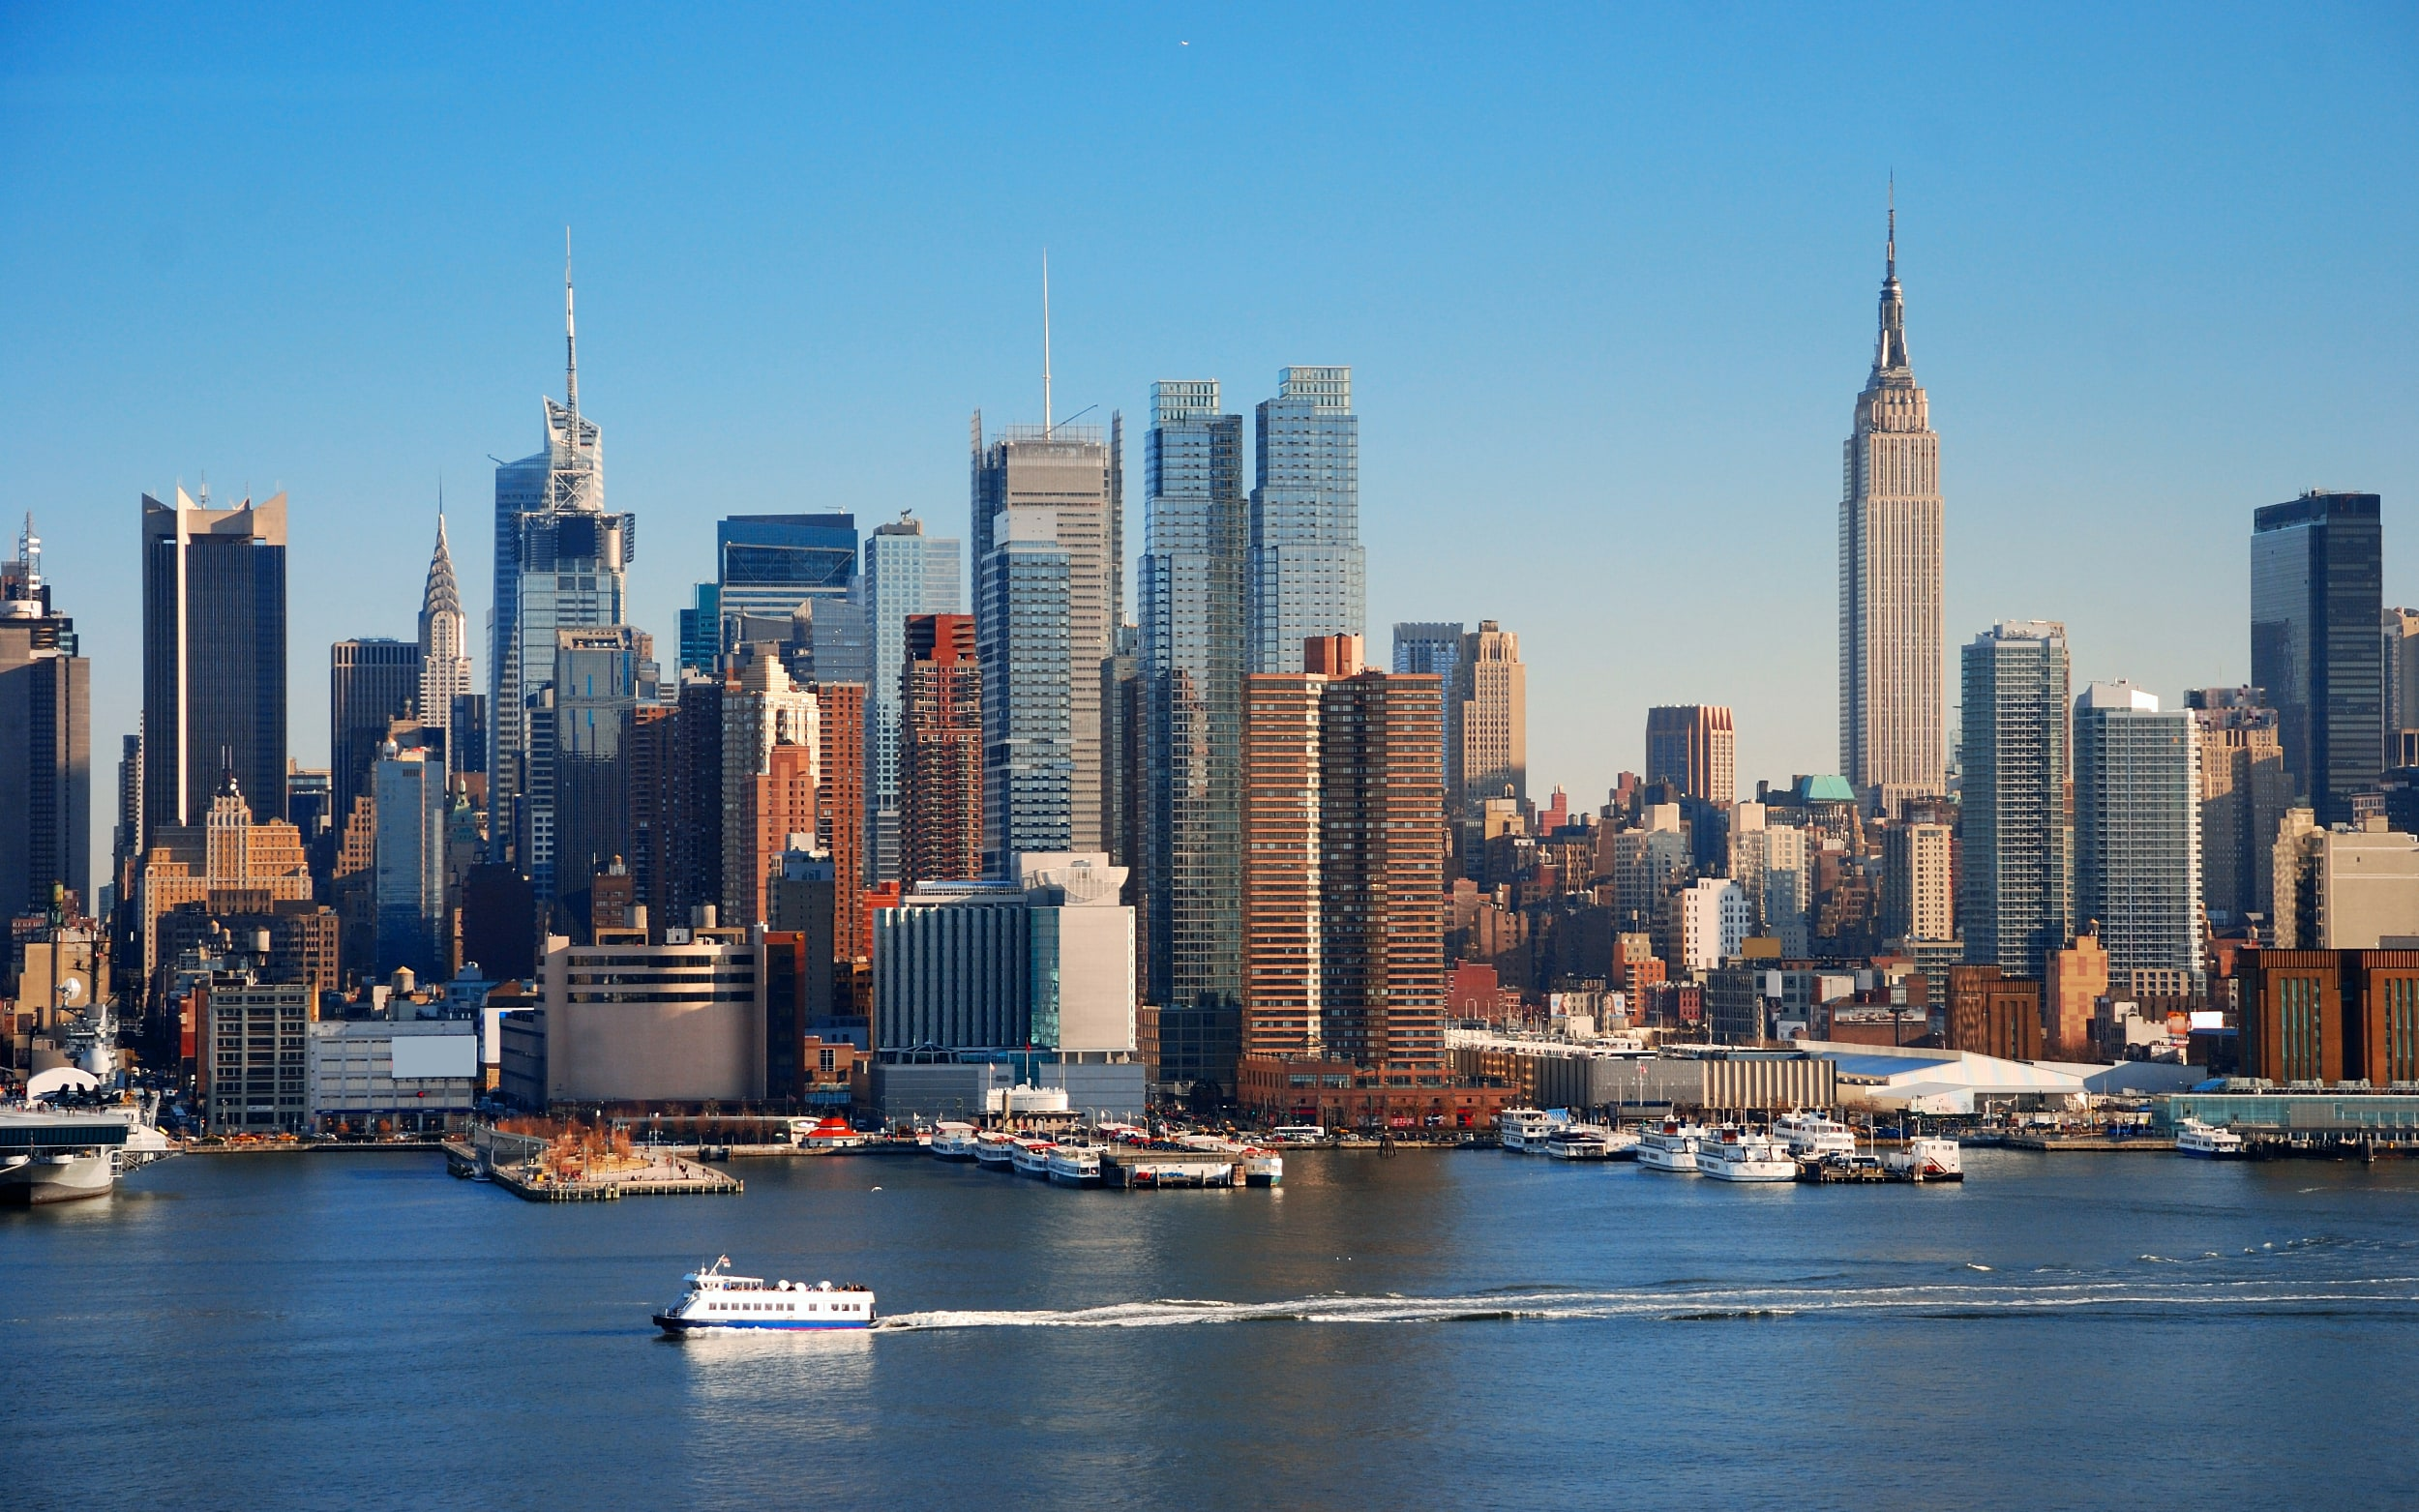 New York City, United States Population (2021) - Population Stat